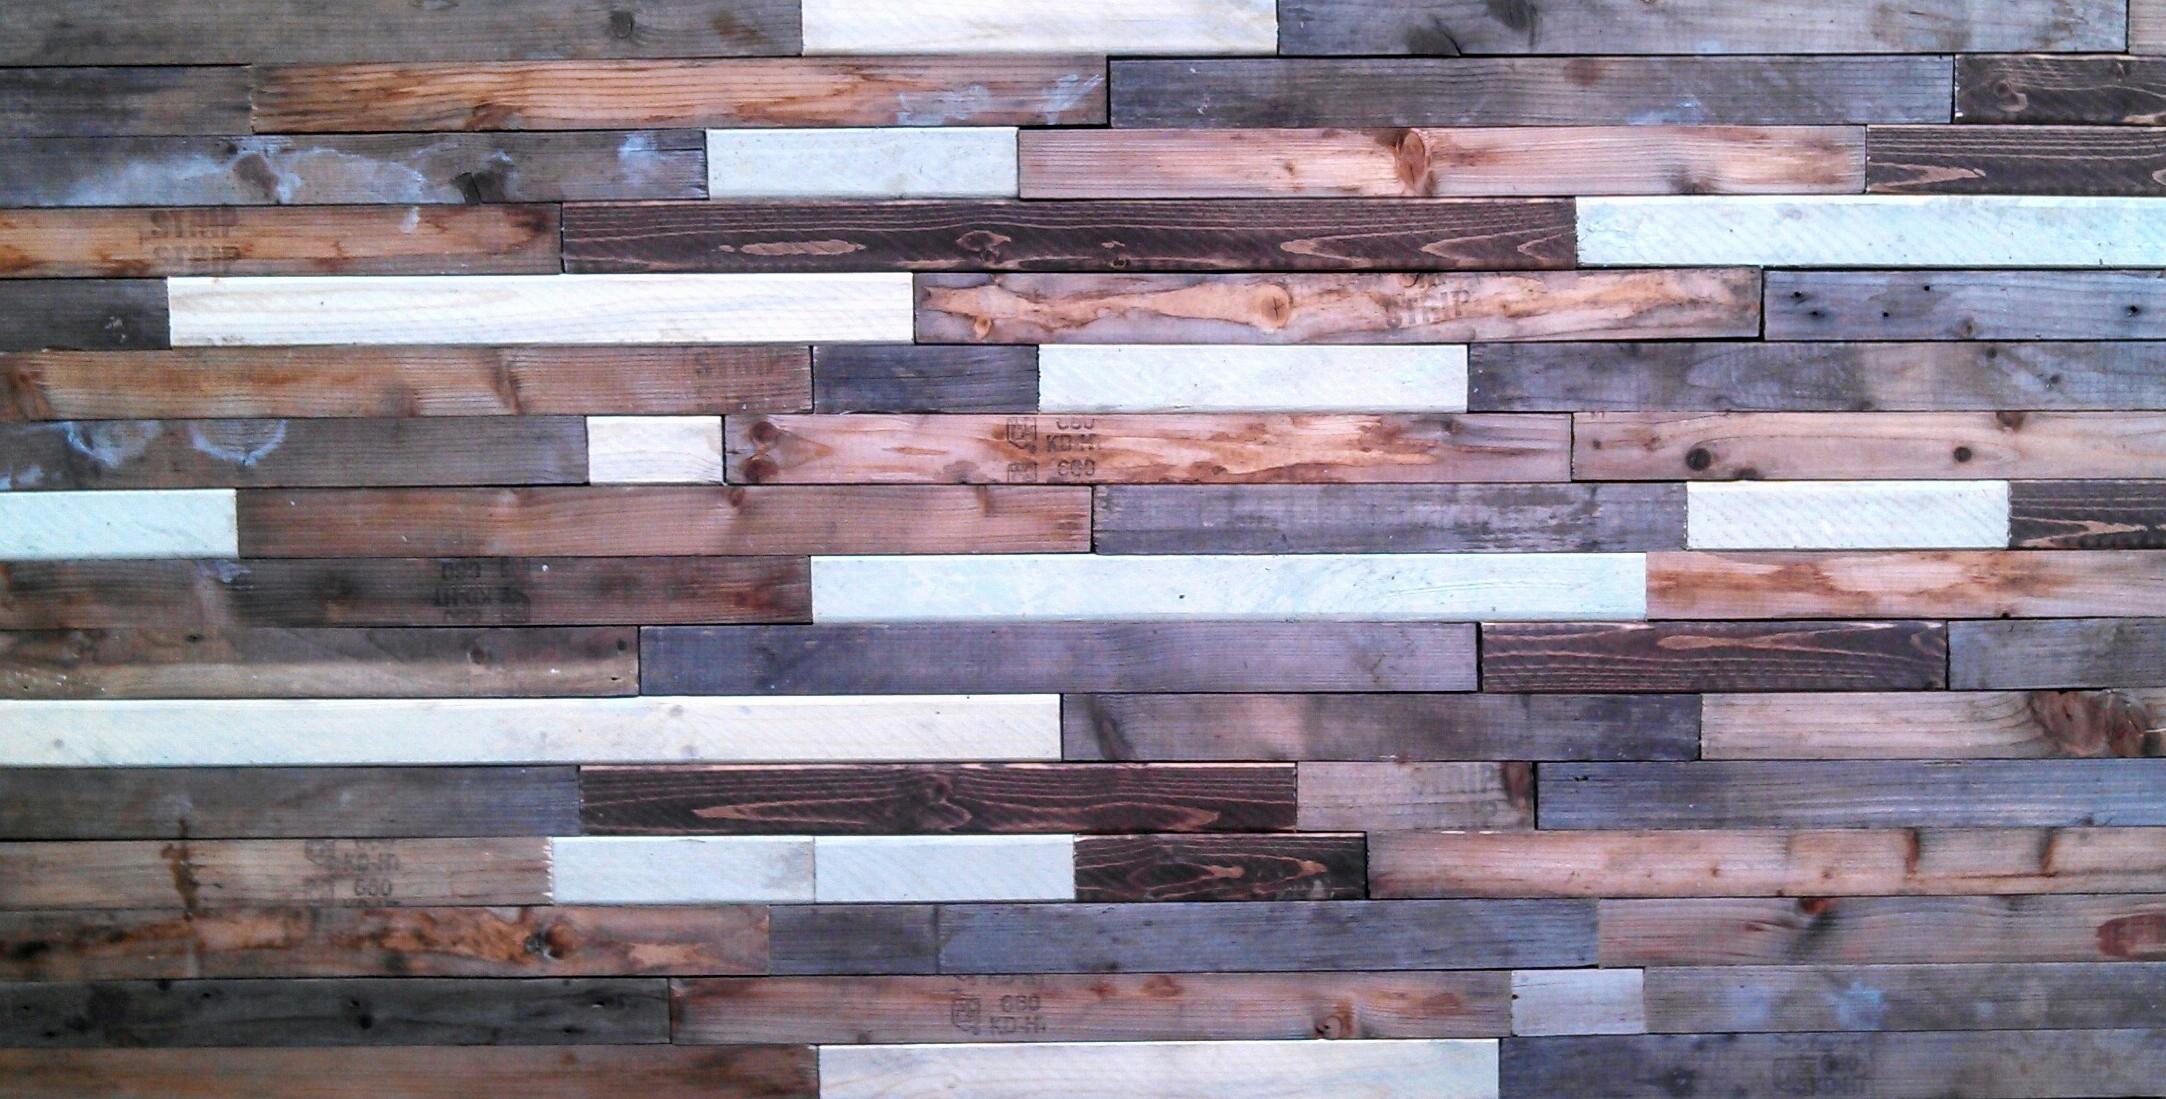 IMG_20151019_102825_961-1-1 (1).jpg wood art.jpg